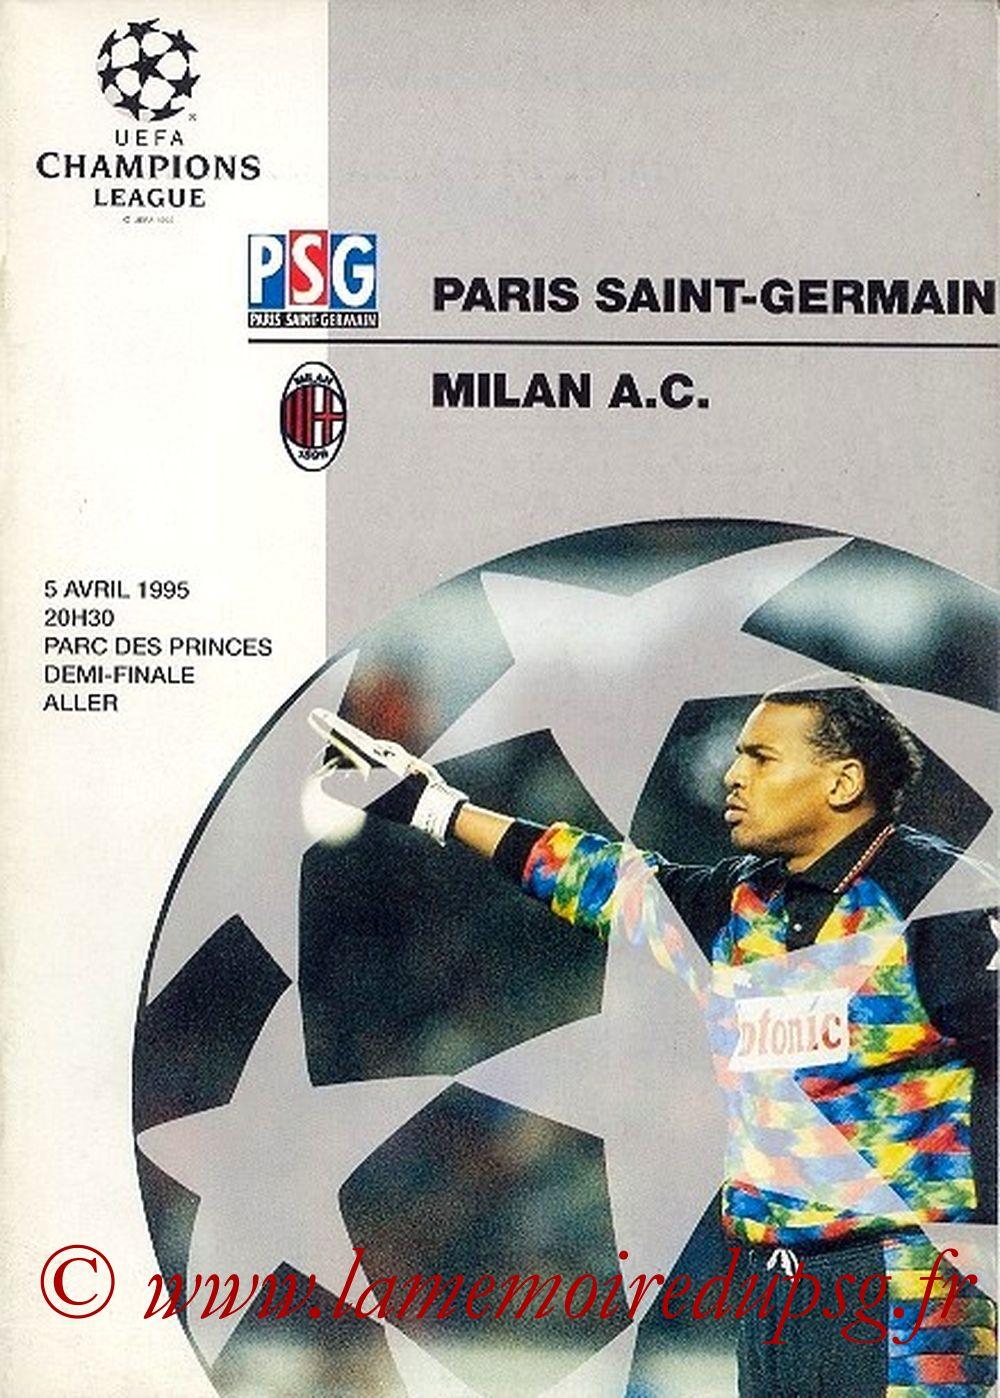 1995-04-05  PSG-Milan AC (Demi-Finale Aller C1, Officiel UEFA)